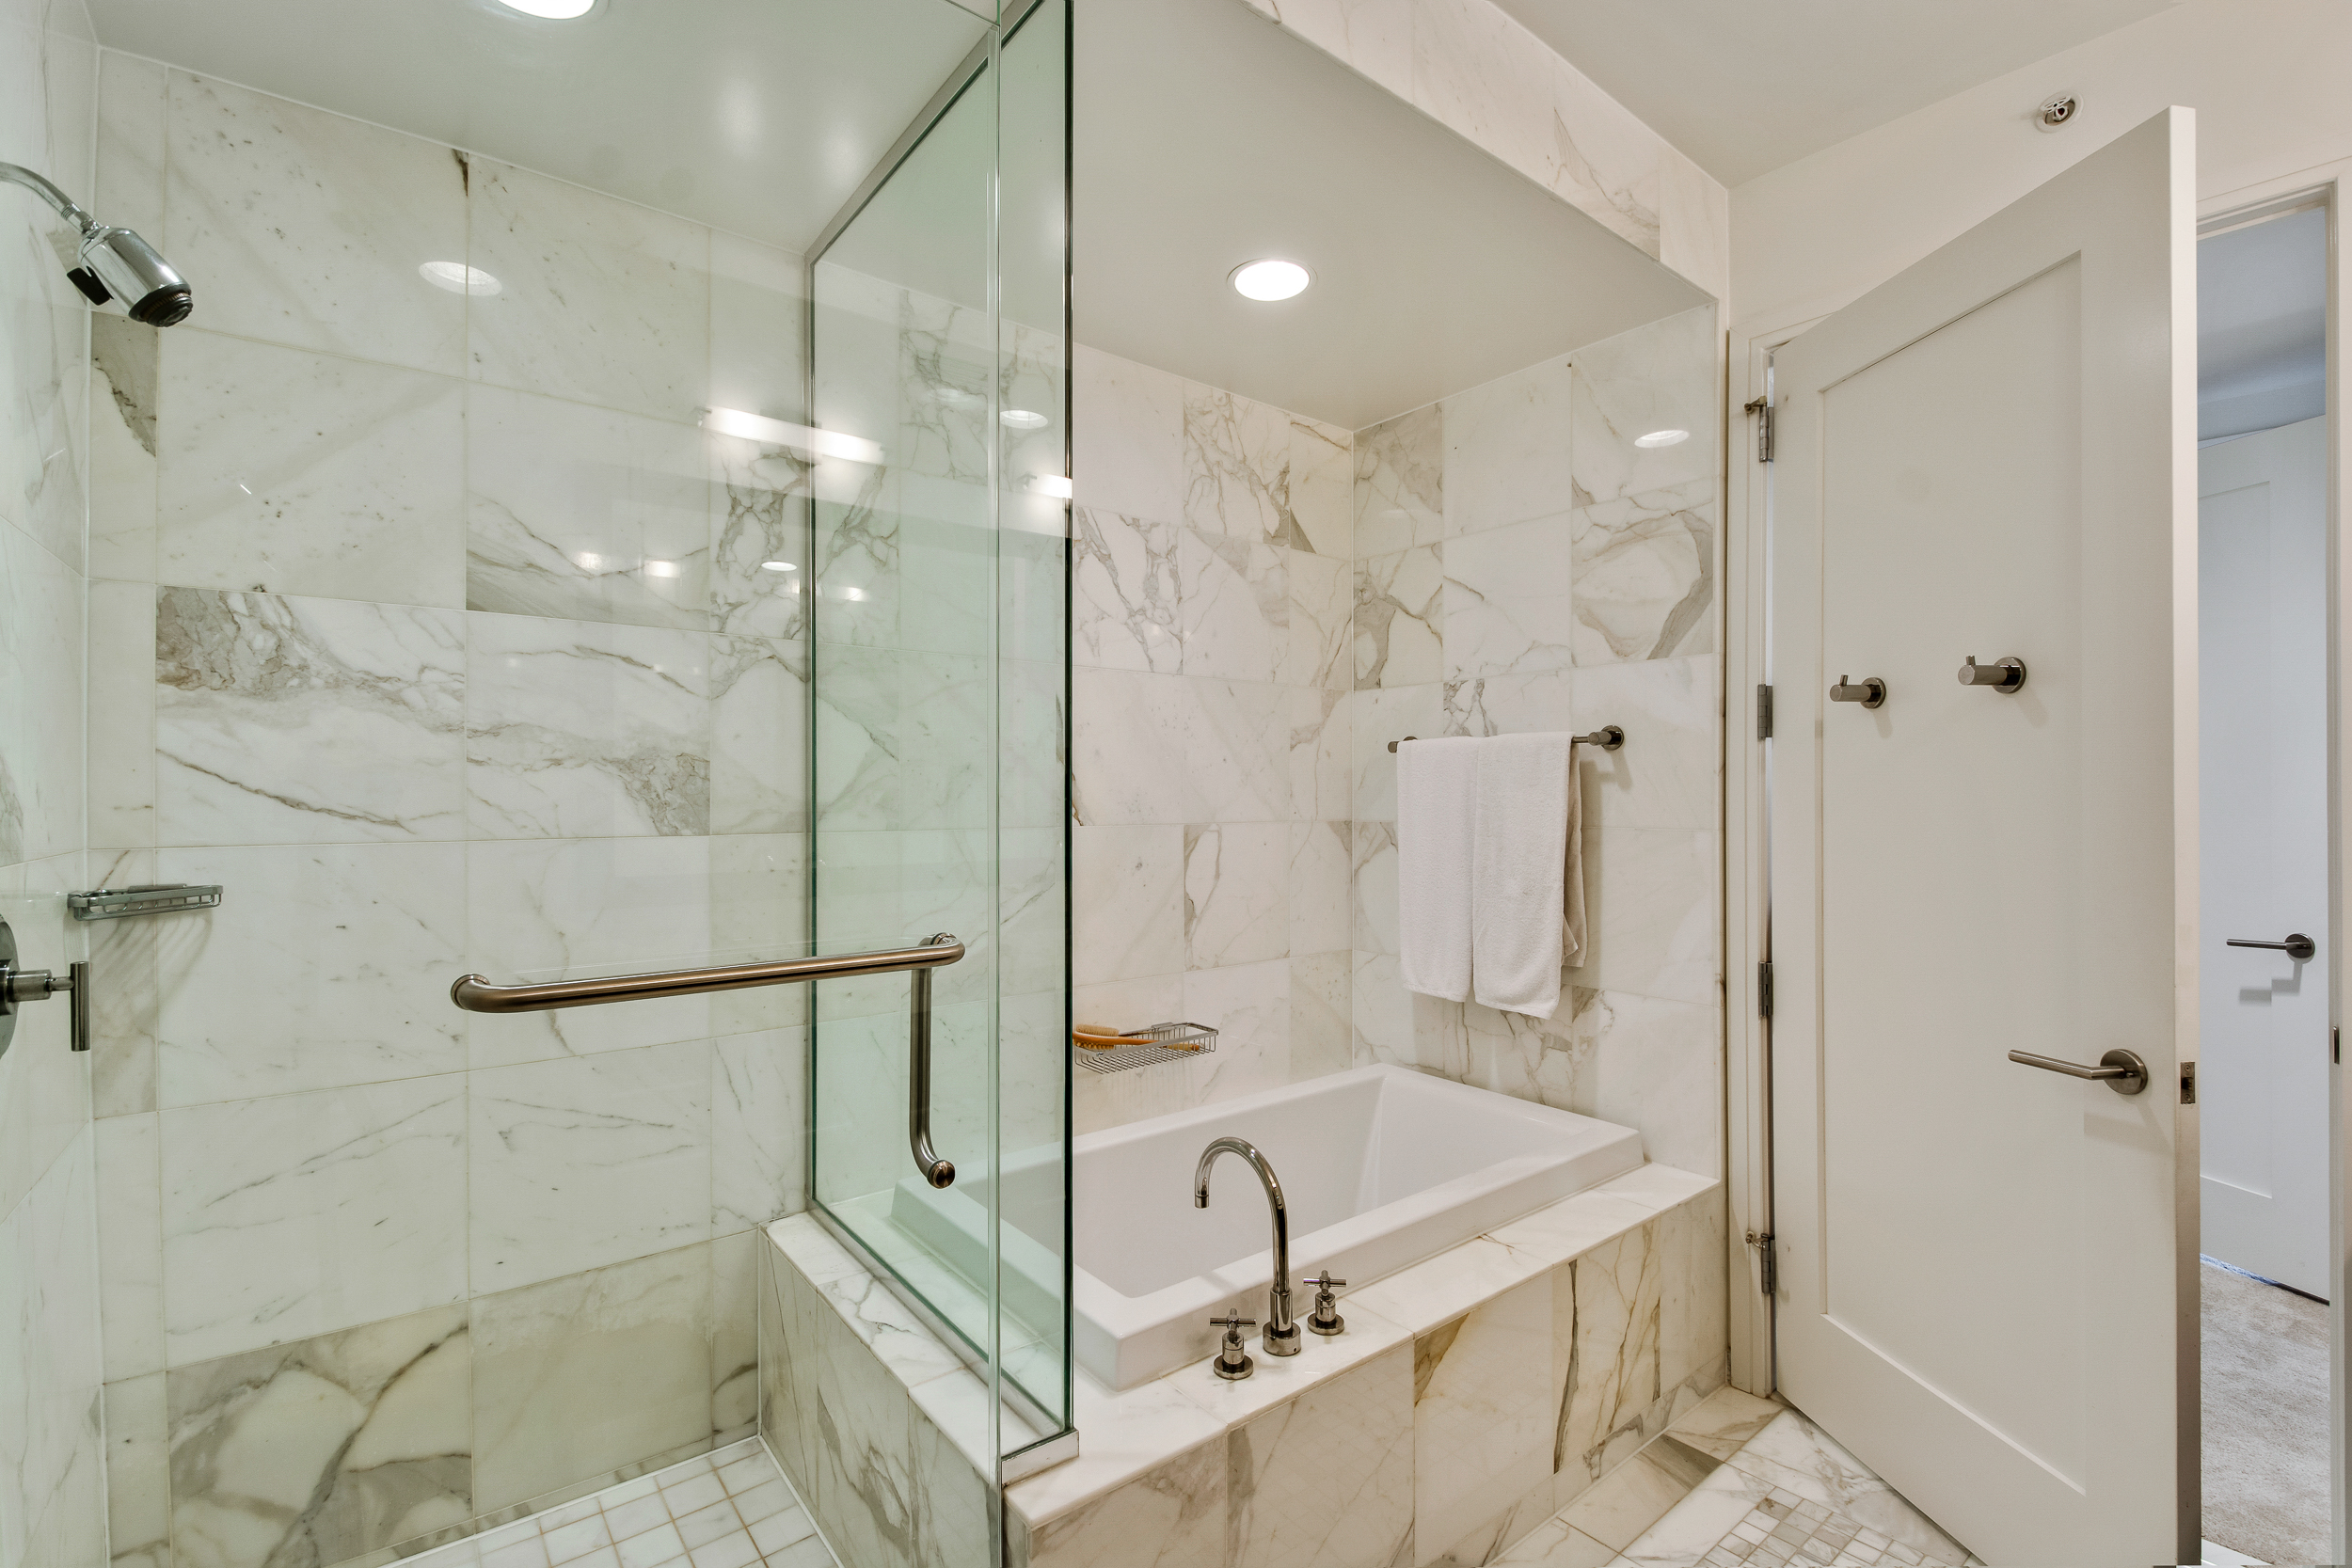 Philadelphia Luxury Home Condo-the ritz carlton residences 20H bryant wilde realty8.jpg